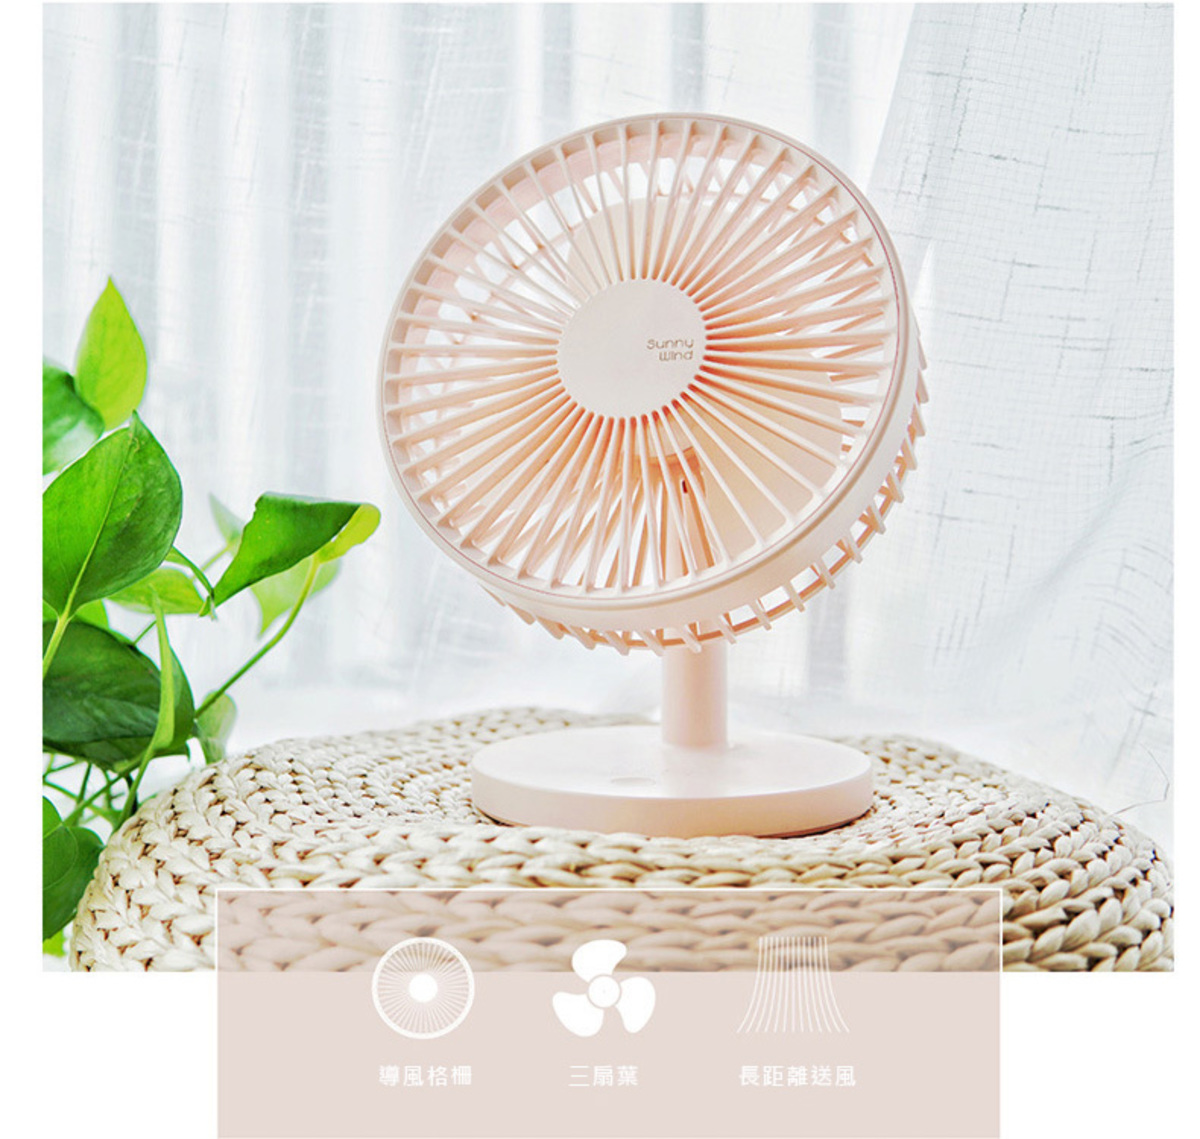 Sunny Wind 7-inch USB rechargeable ultra-quiet electric fan / table fan Pink